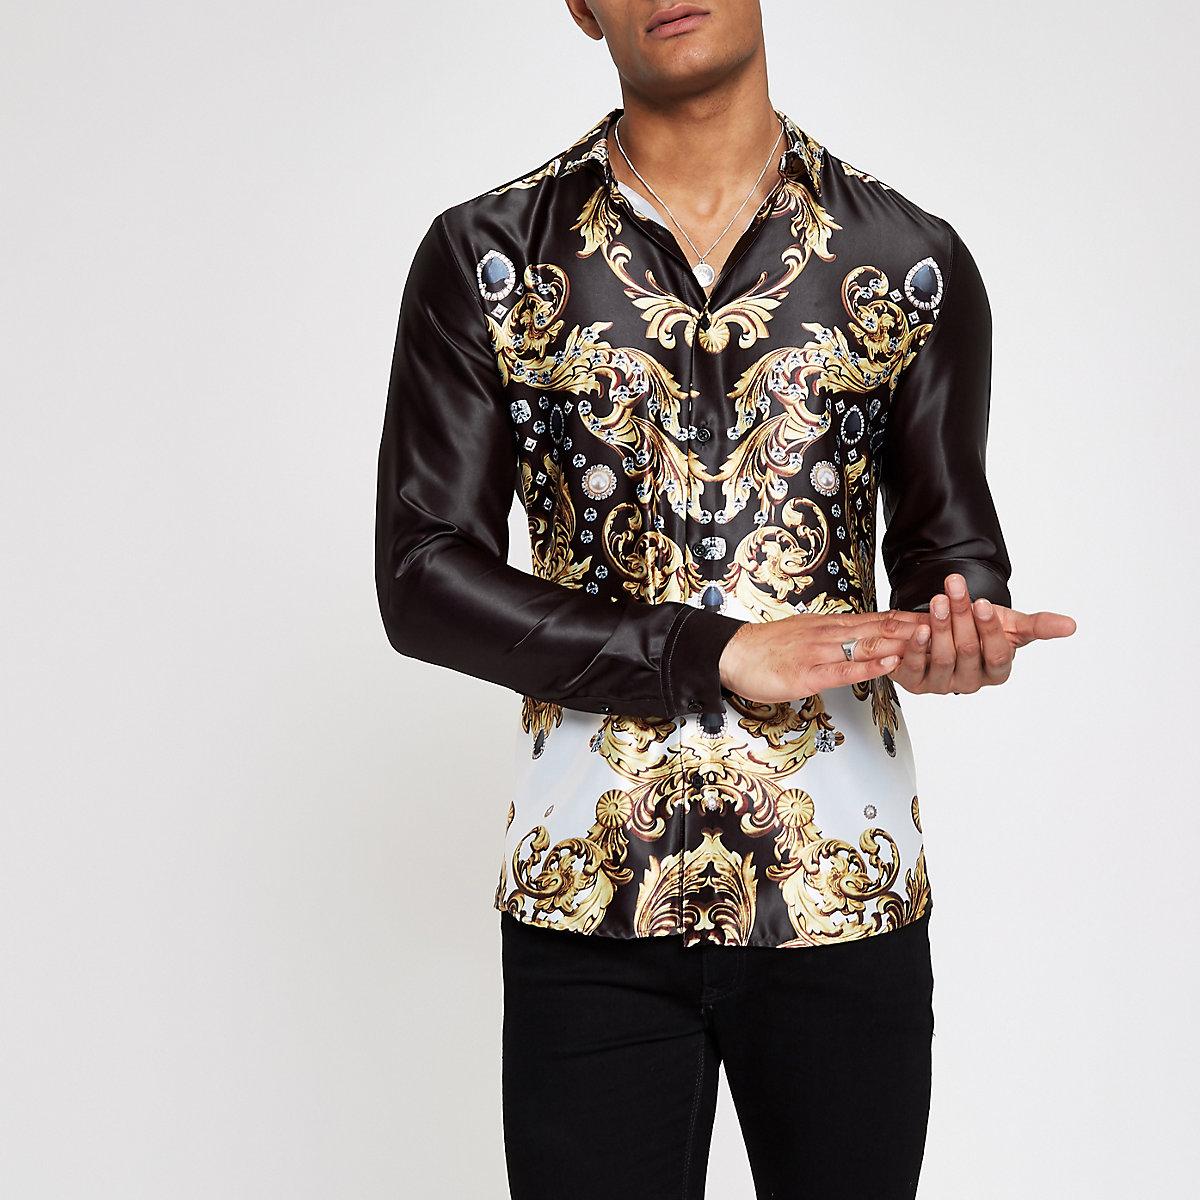 Jaded black baroque satin shirt